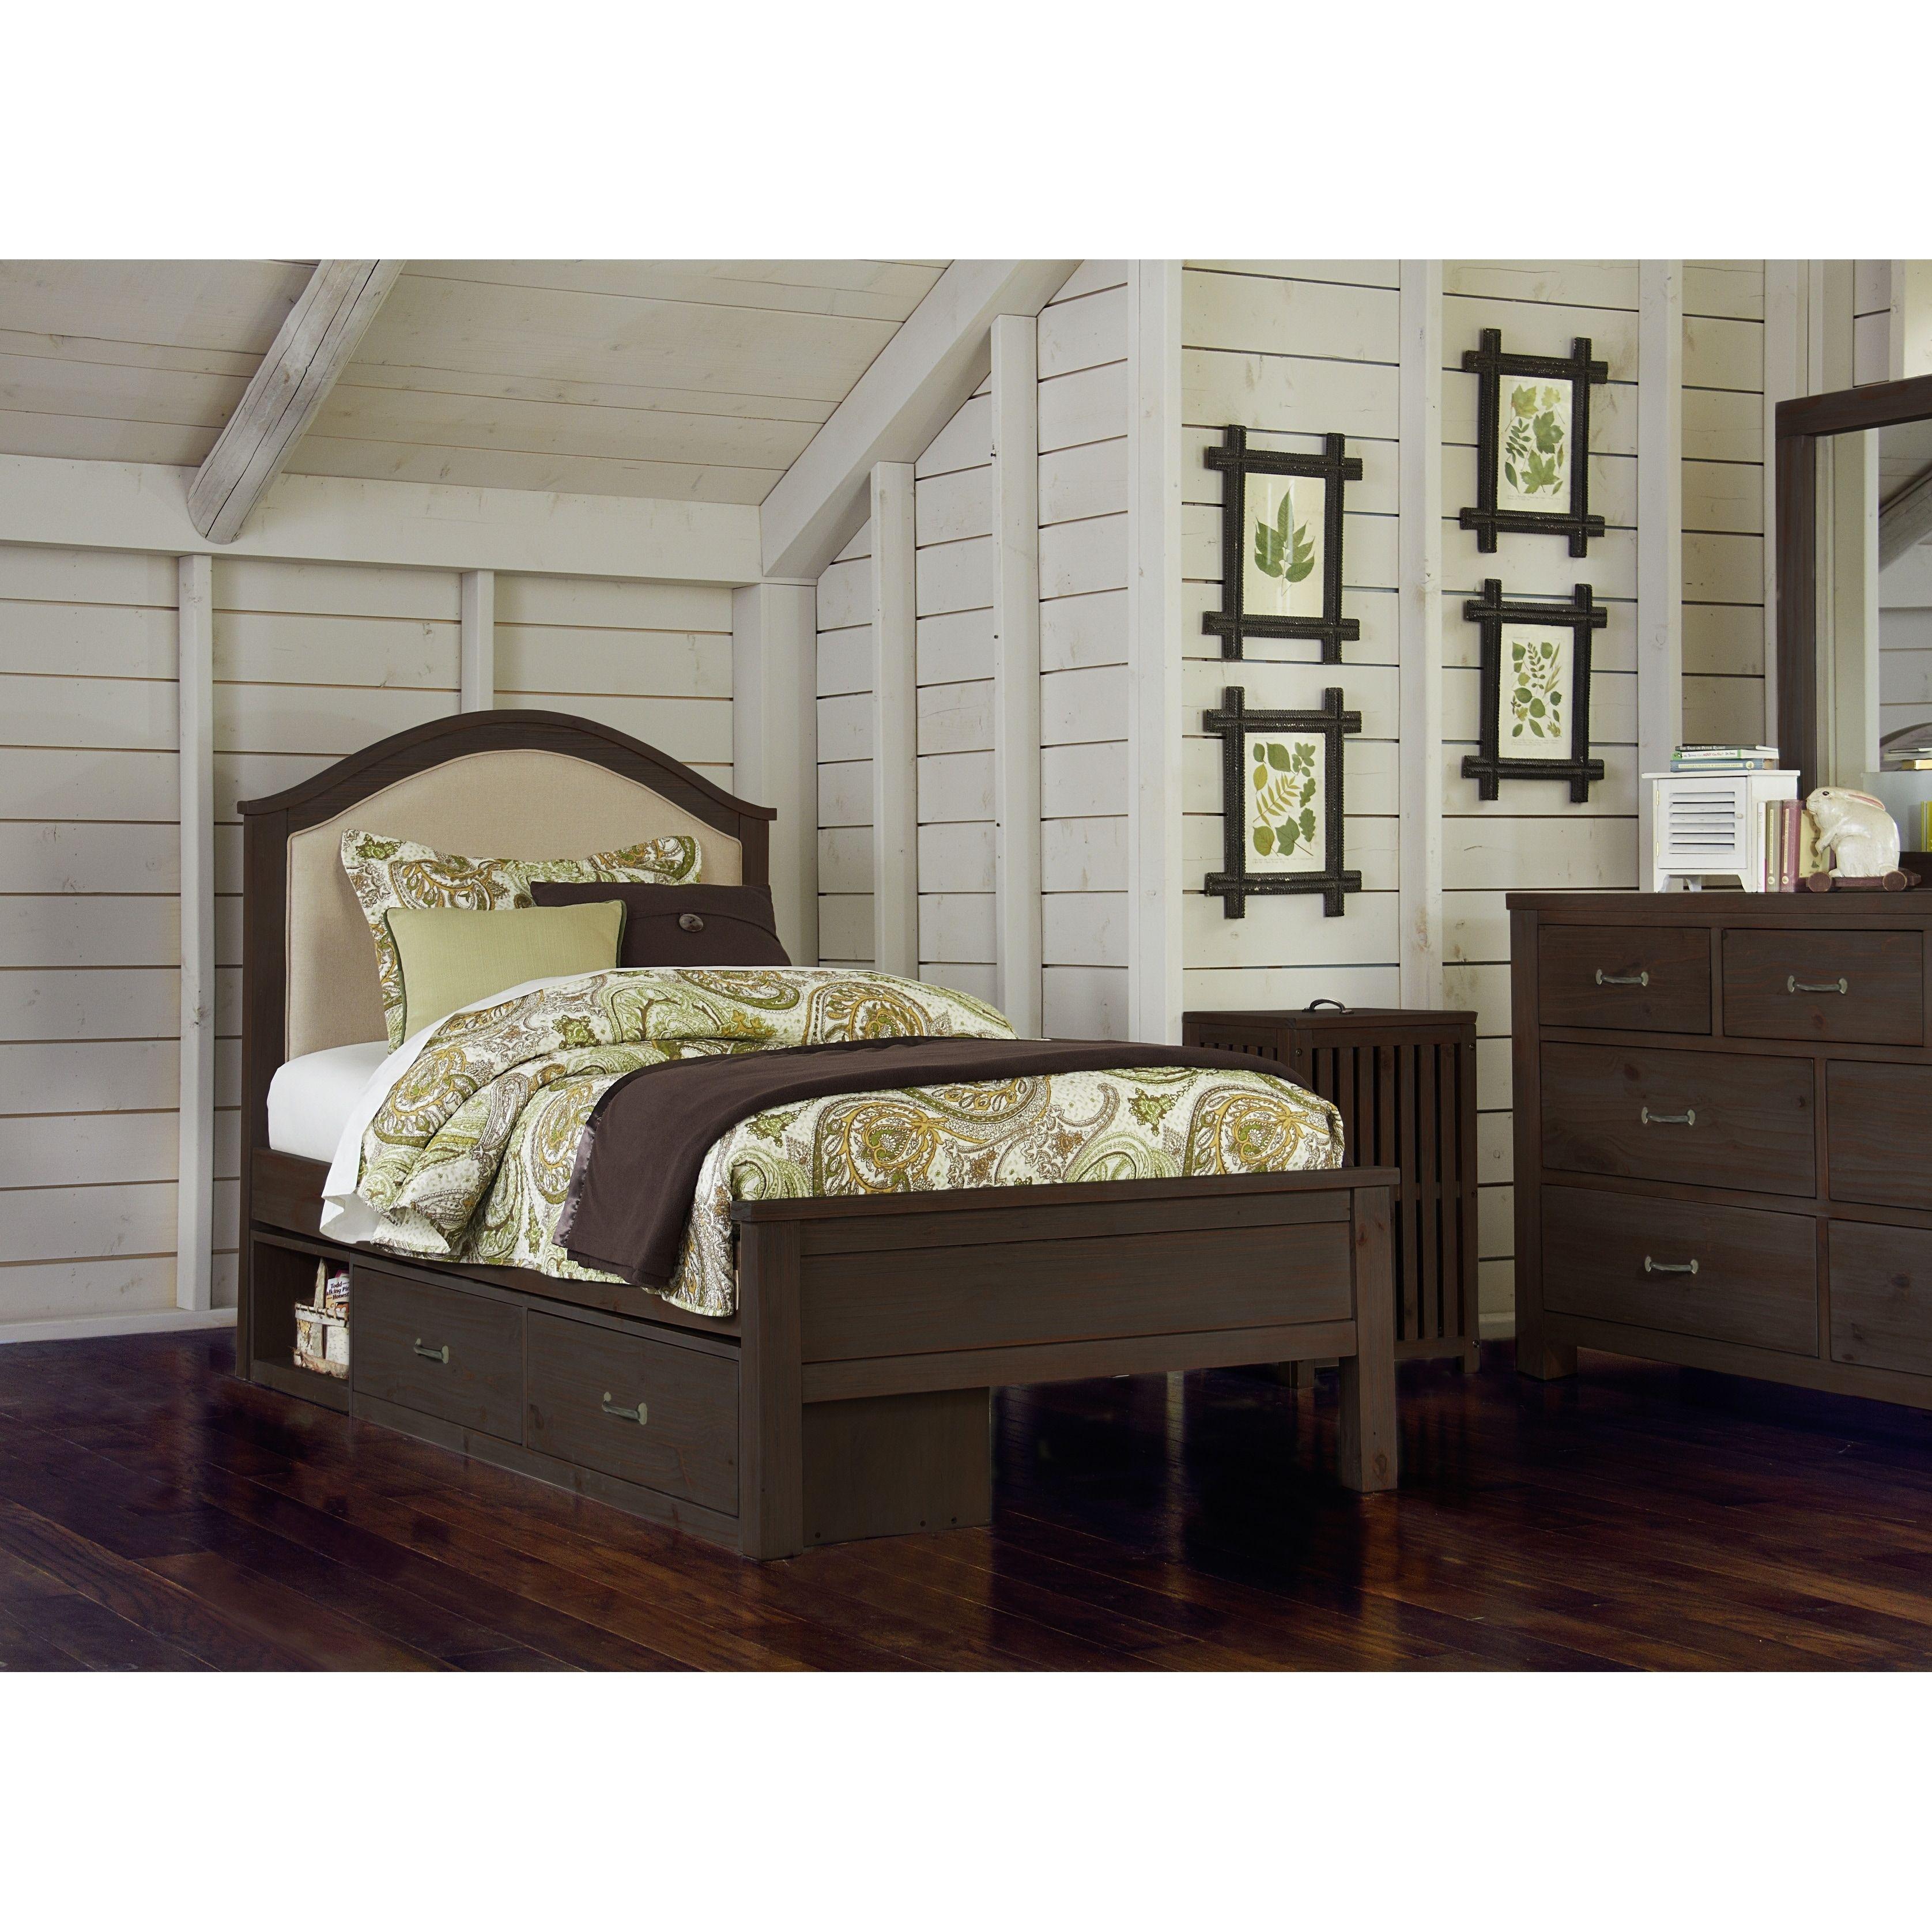 NE Kids Hillsdale Highlands Bailey Espresso Pine Twin Size Upholstered  Storage Bed